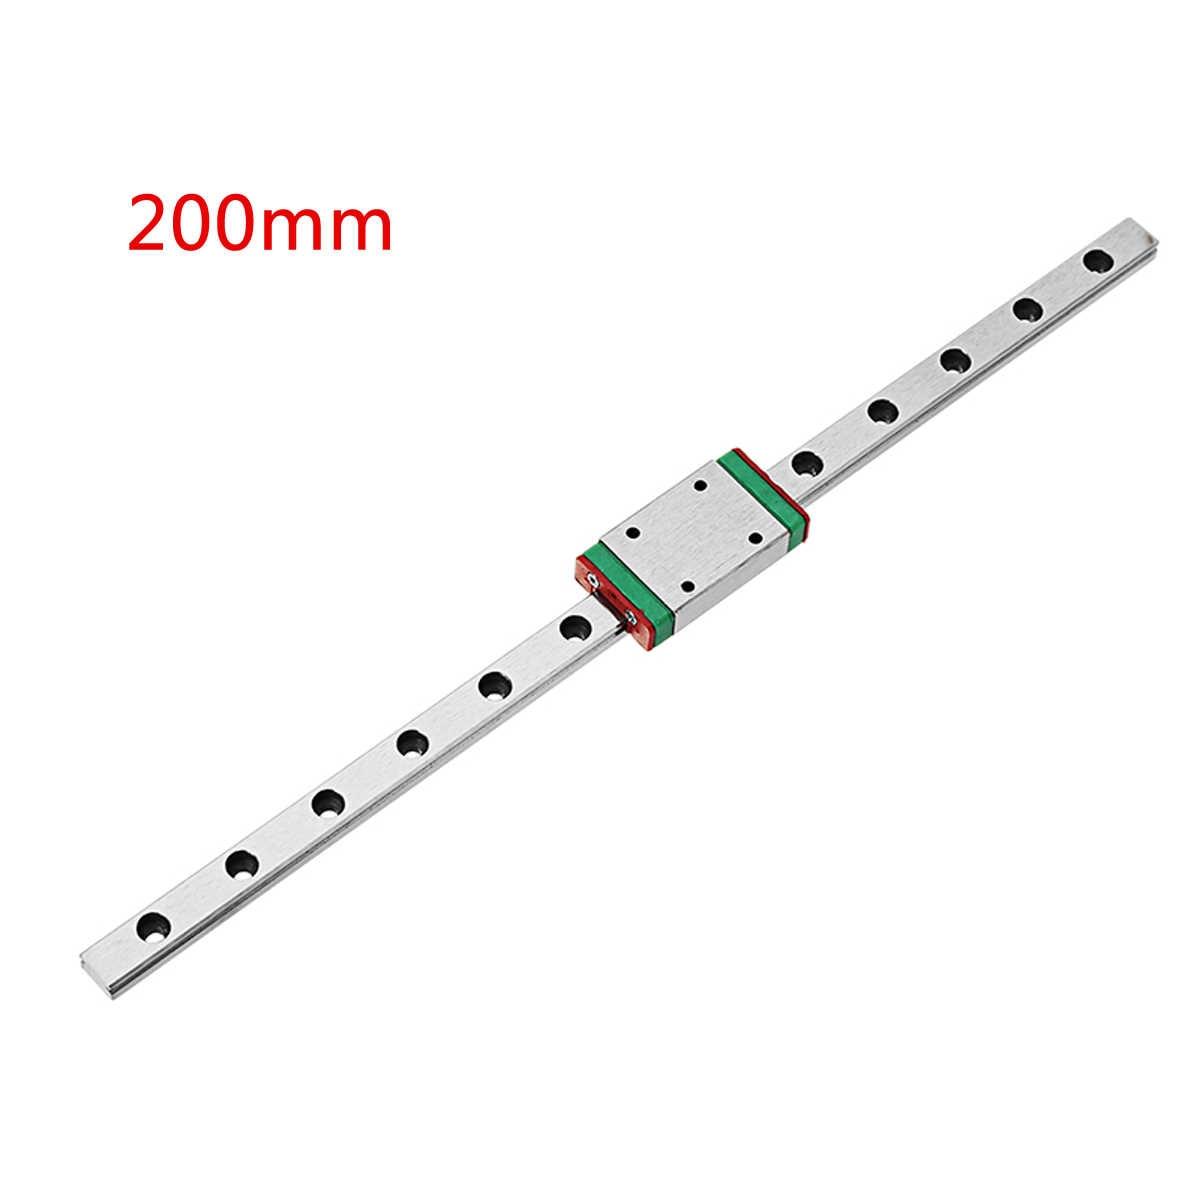 "Suleve 1 יחידות 200 מ""מ אורך ינארית מדריך Rail עם MGN7H ליניארי רכבת בלוק תובלה חליפת עבור מחוון בלוק 3D מדפסת CNC חלקי"